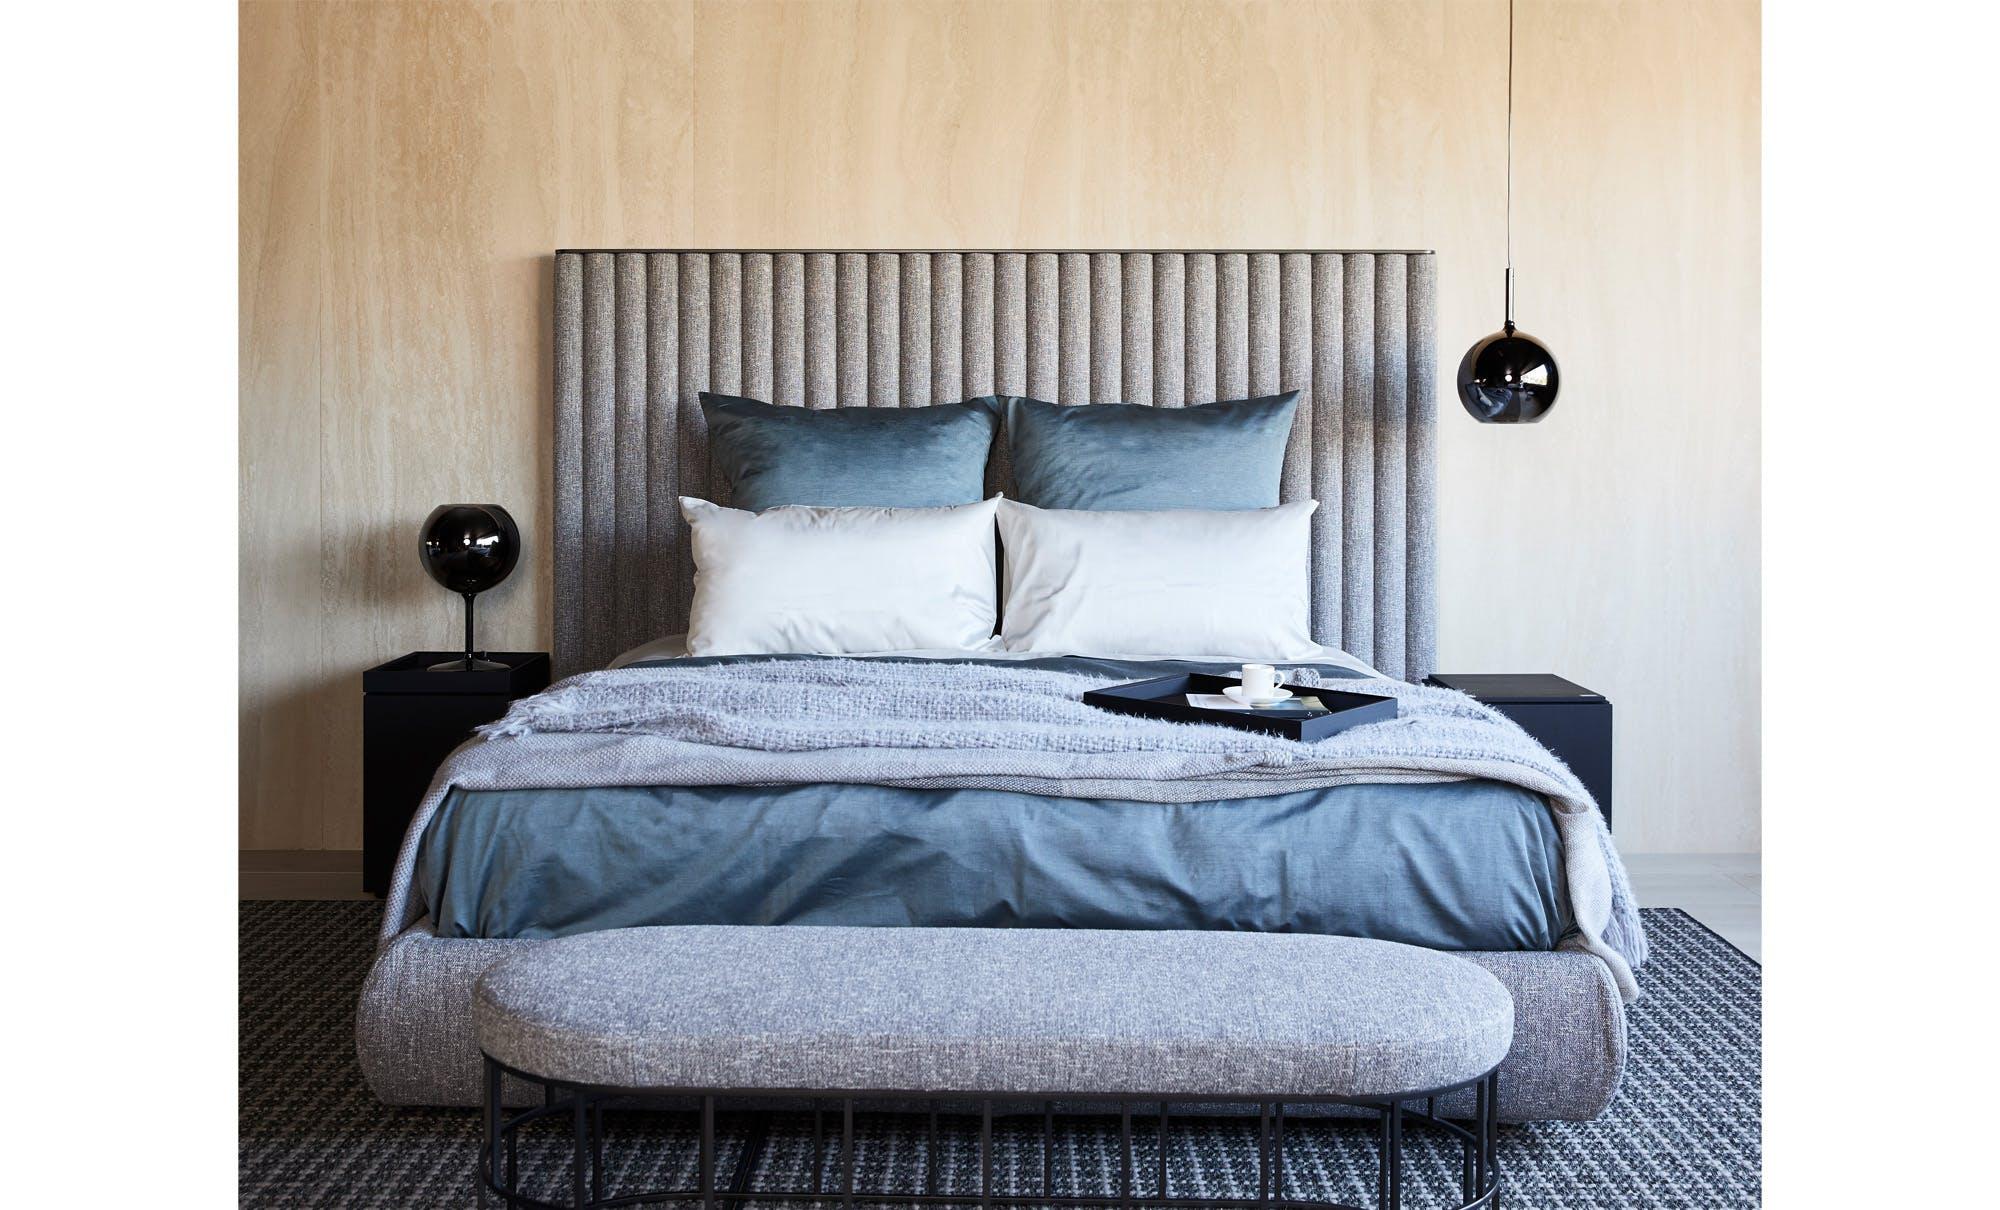 Biarritz bed by Flexform Mood - Fanuli Furniture